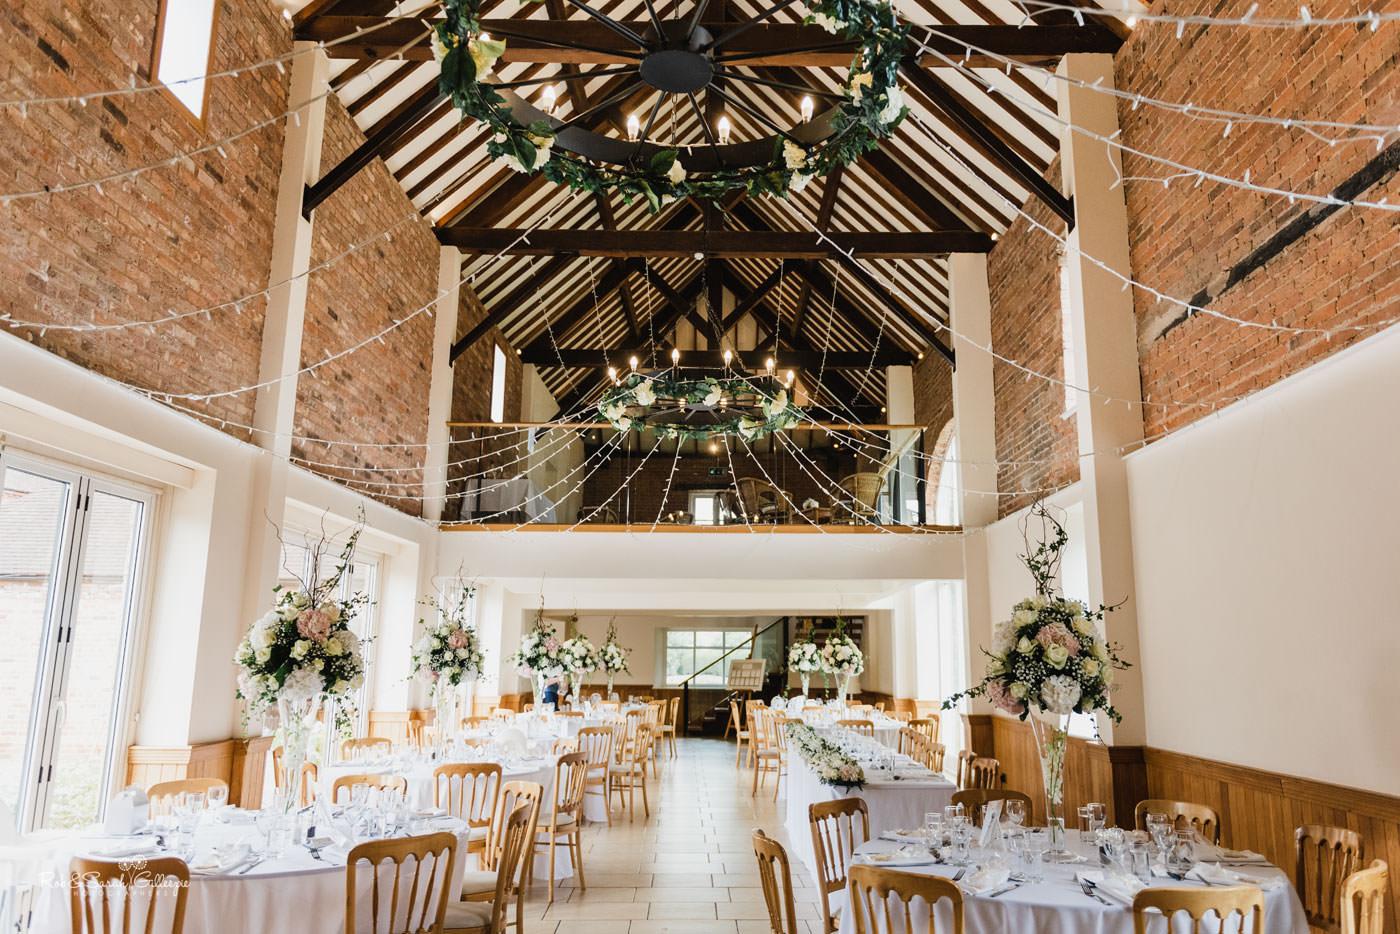 Delbury Hall set up for wedding breakfast